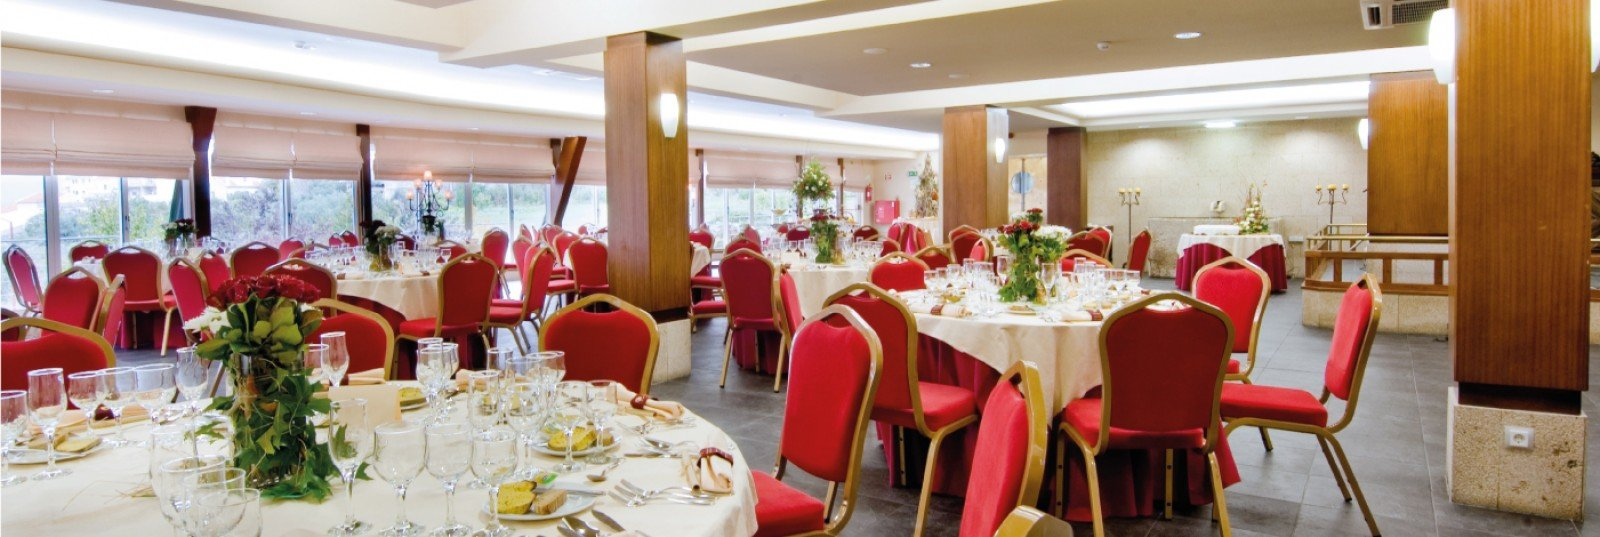 Hotel Eurosol Seia Camelo - banquet hall